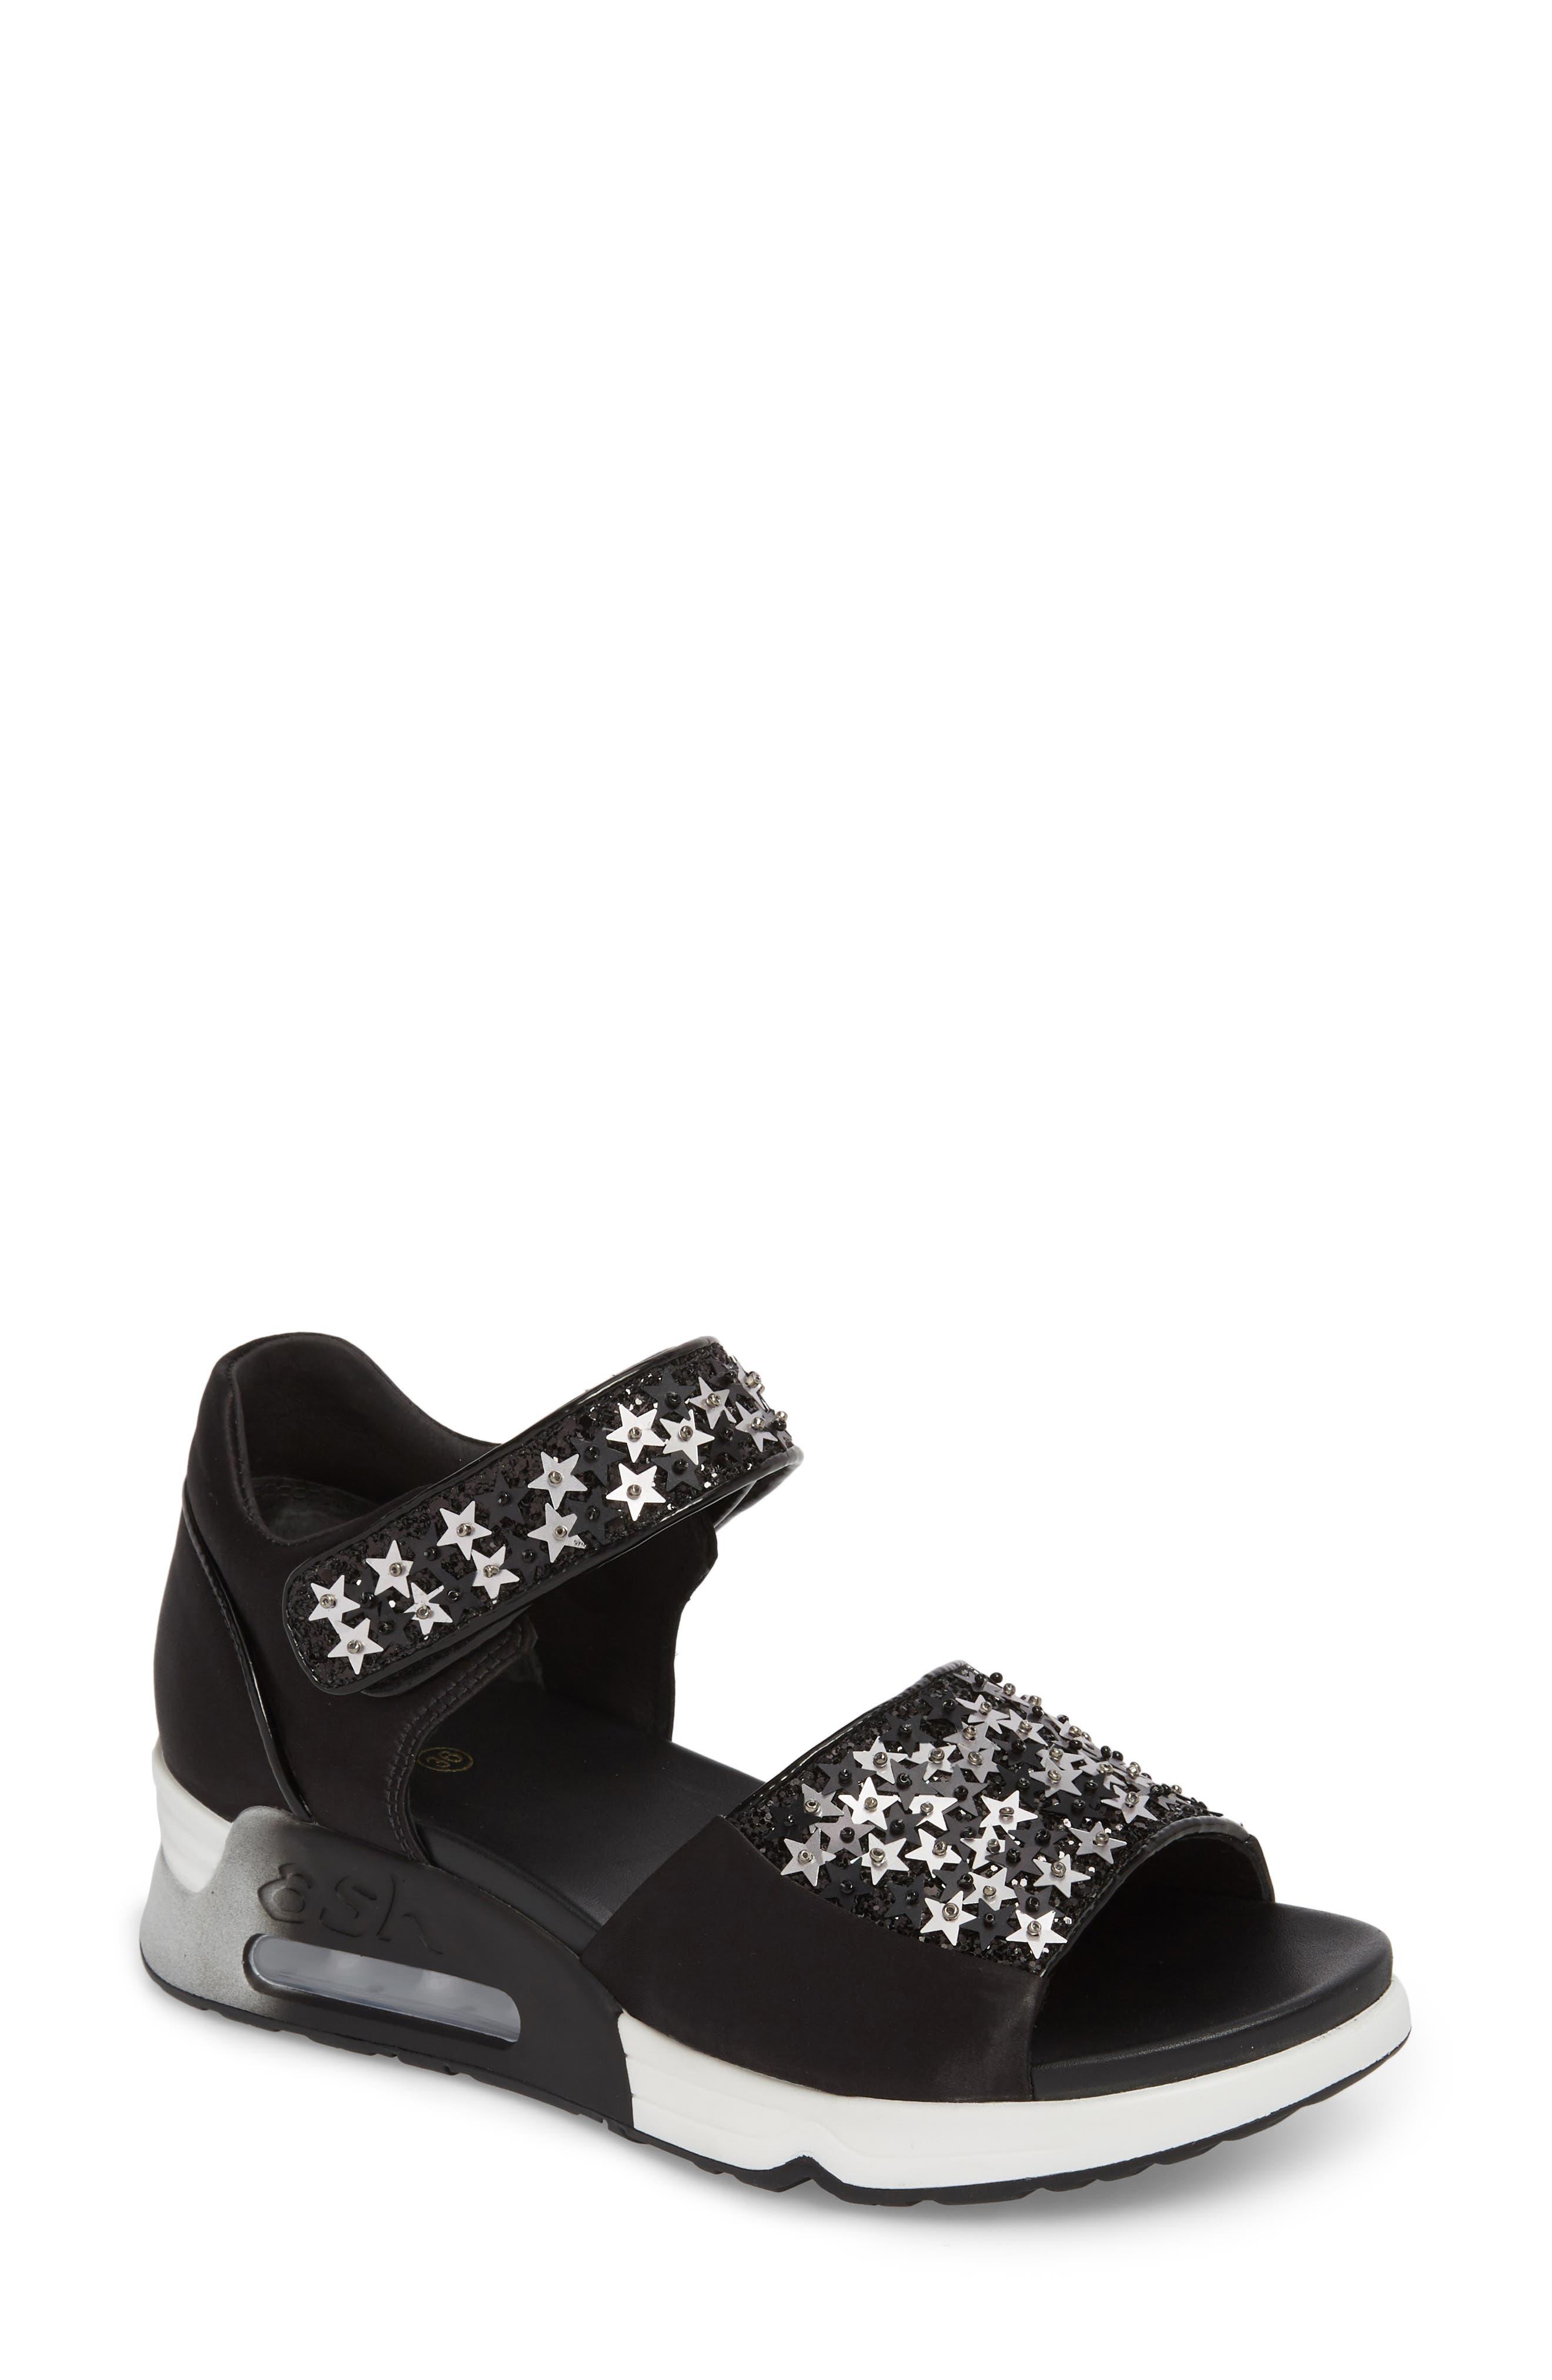 Alternate Image 1 Selected - Ash Lotus Star Sandal (Women)